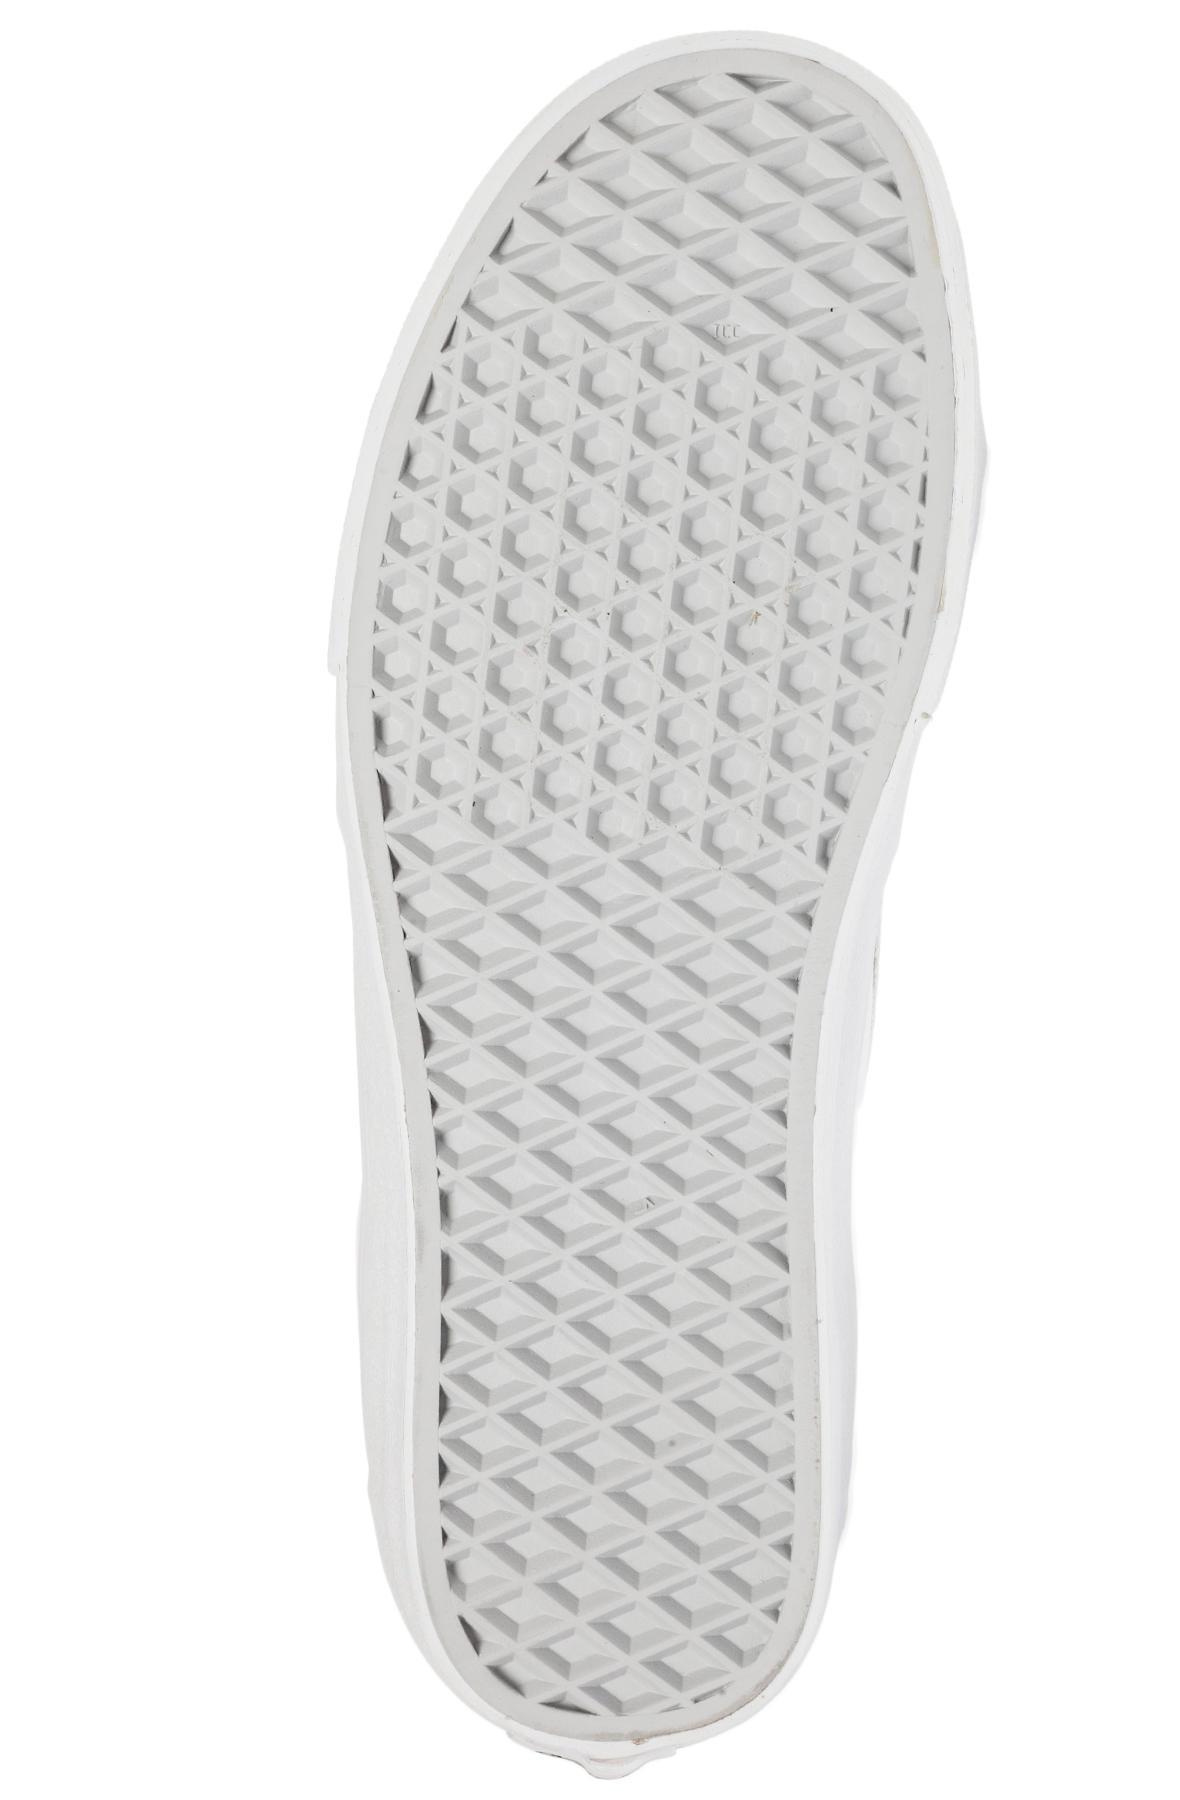 Vans Footwear Core Classics Sneaker The Sk8-Hi in True White